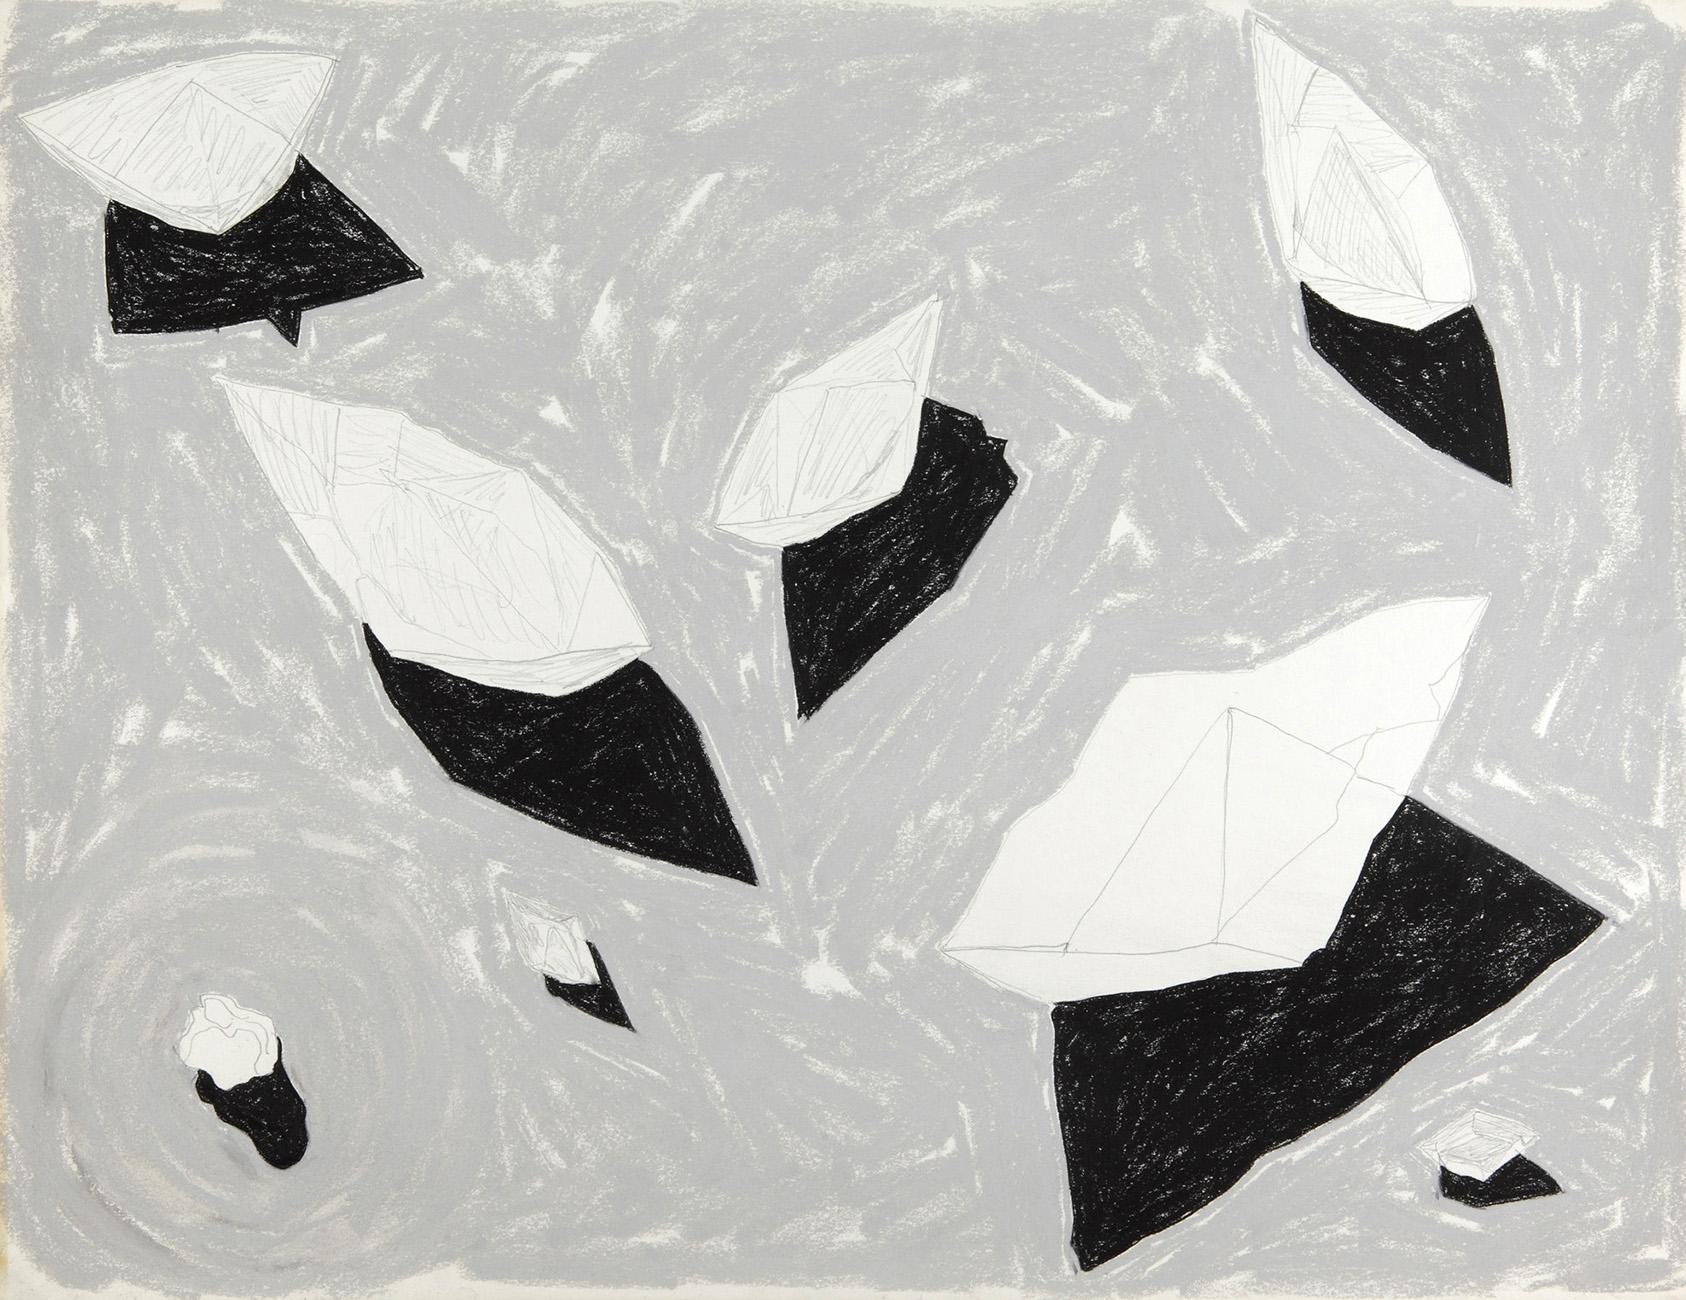 Akkrum 1 -  potlood & pastelkrijt  -  50x70 cm - verkocht